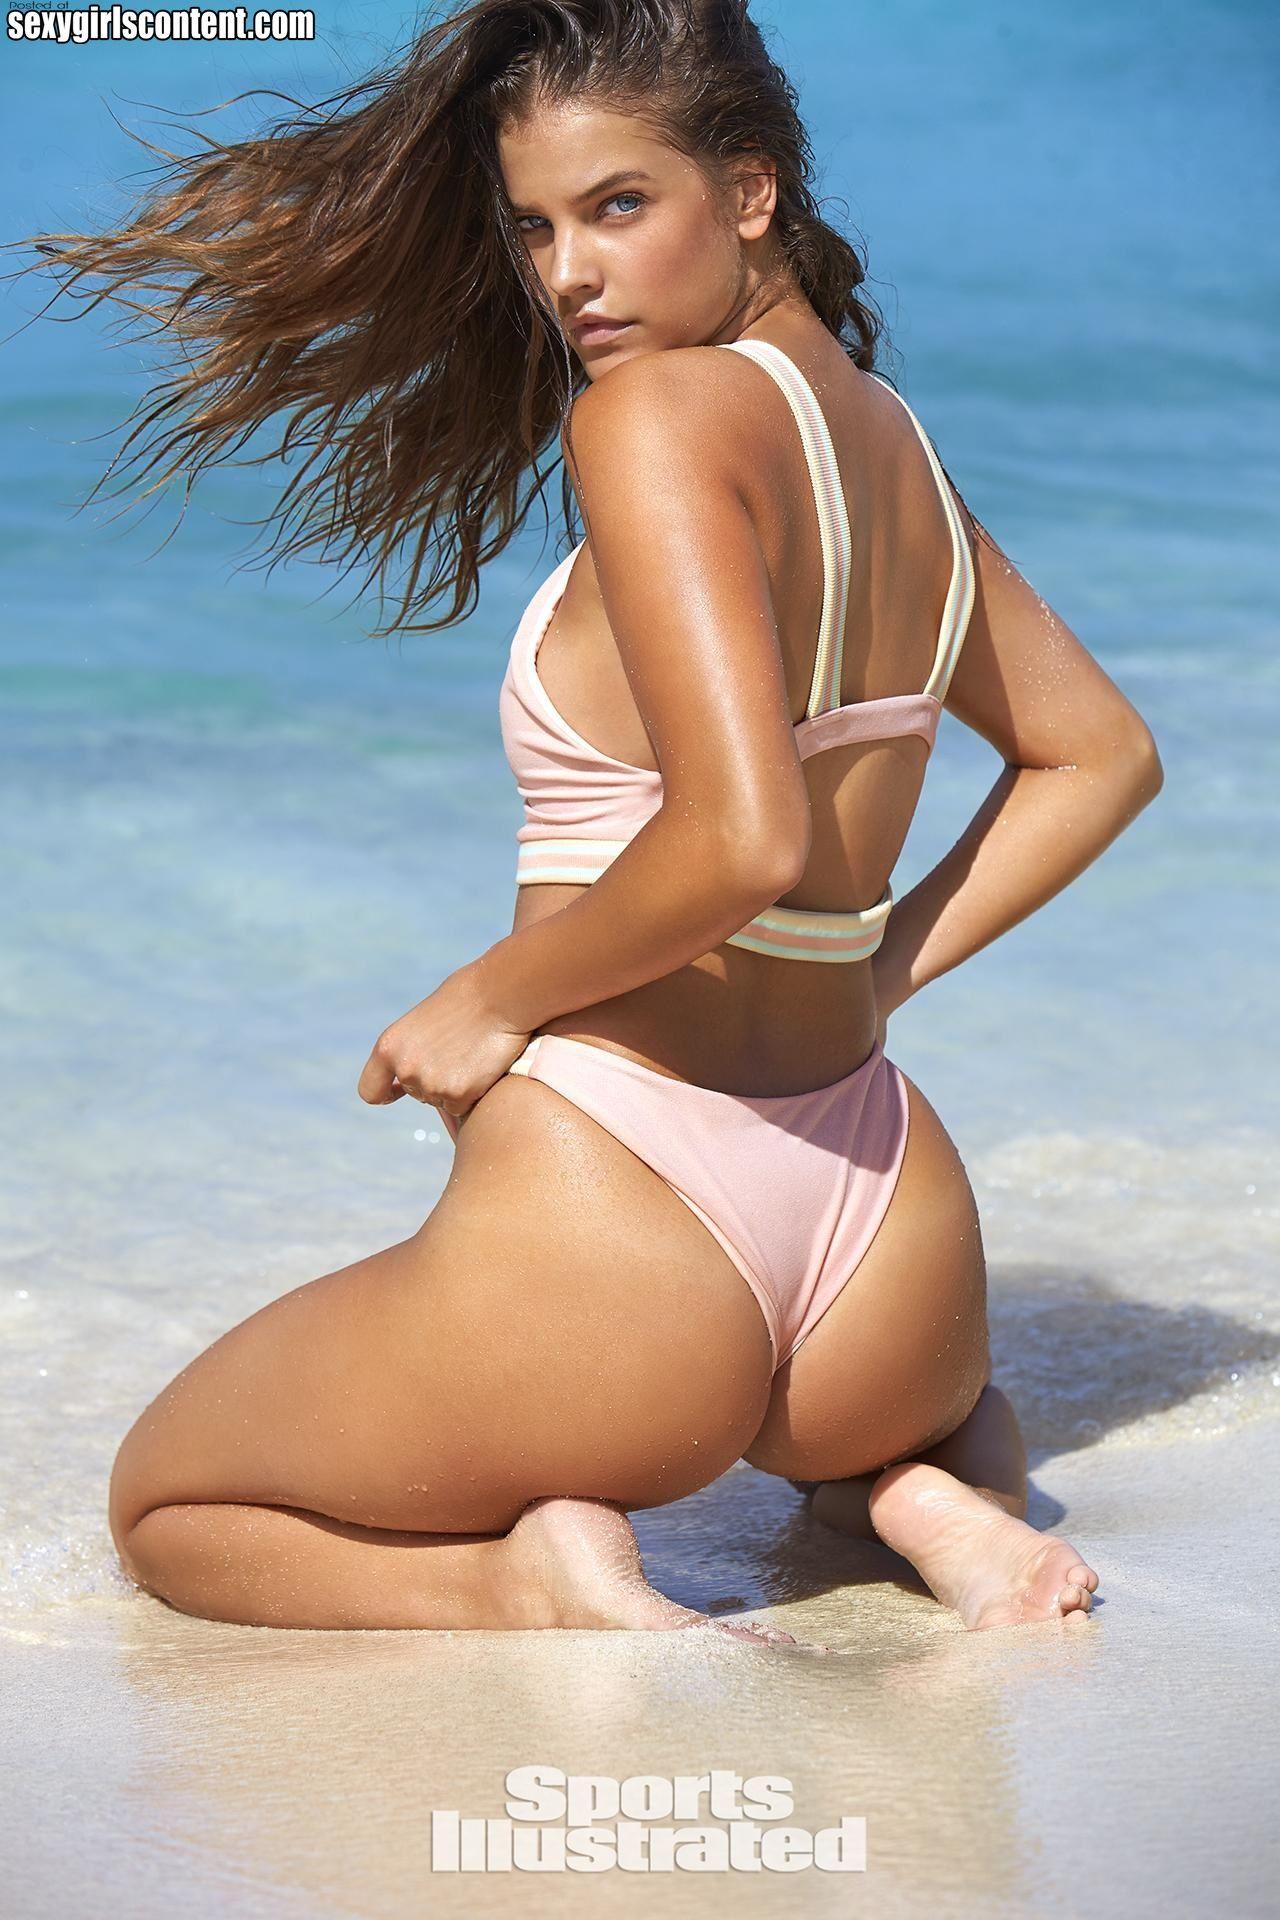 Sexy Barbara Palvin nudes (65 photos), Pussy, Hot, Boobs, bra 2015